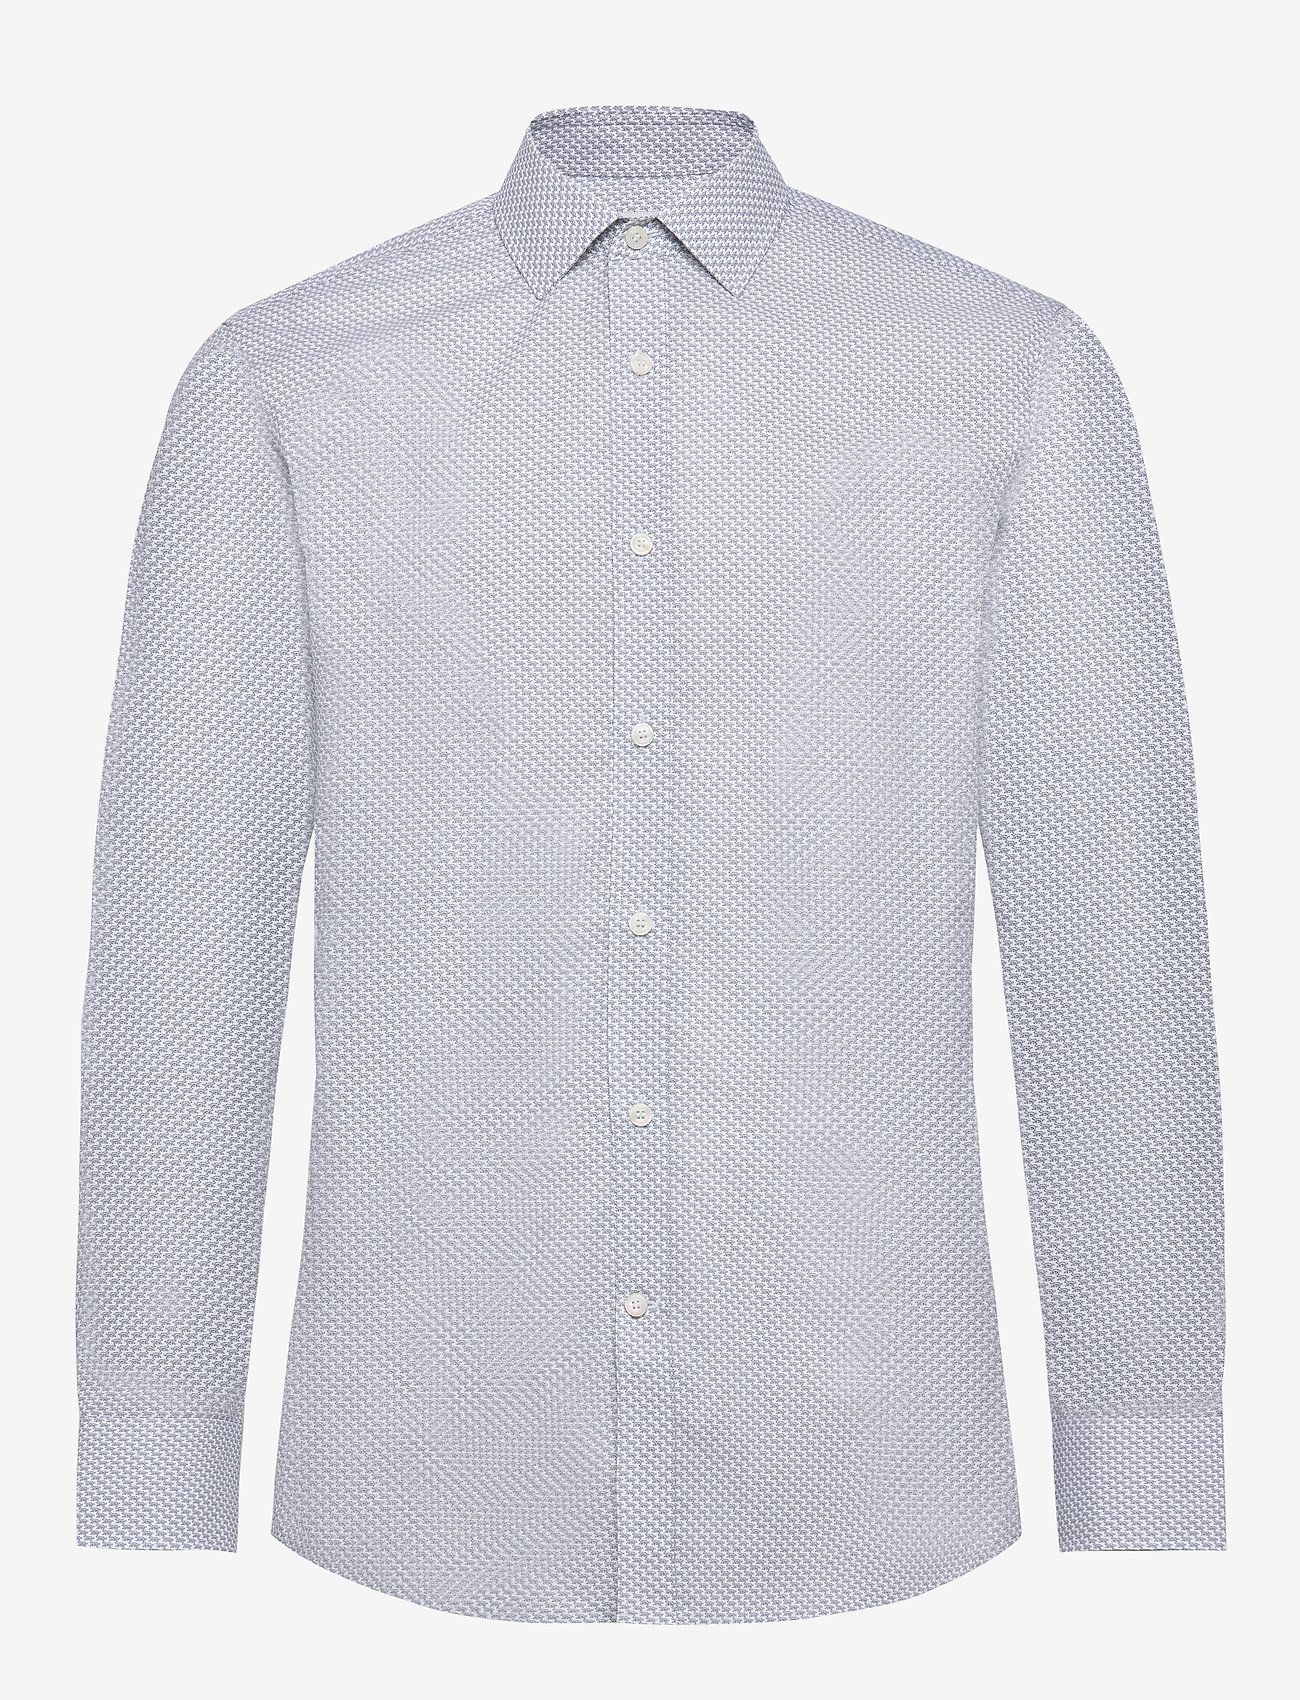 Tiger of Sweden - FRIDOLF - basic skjorter - blue - 0